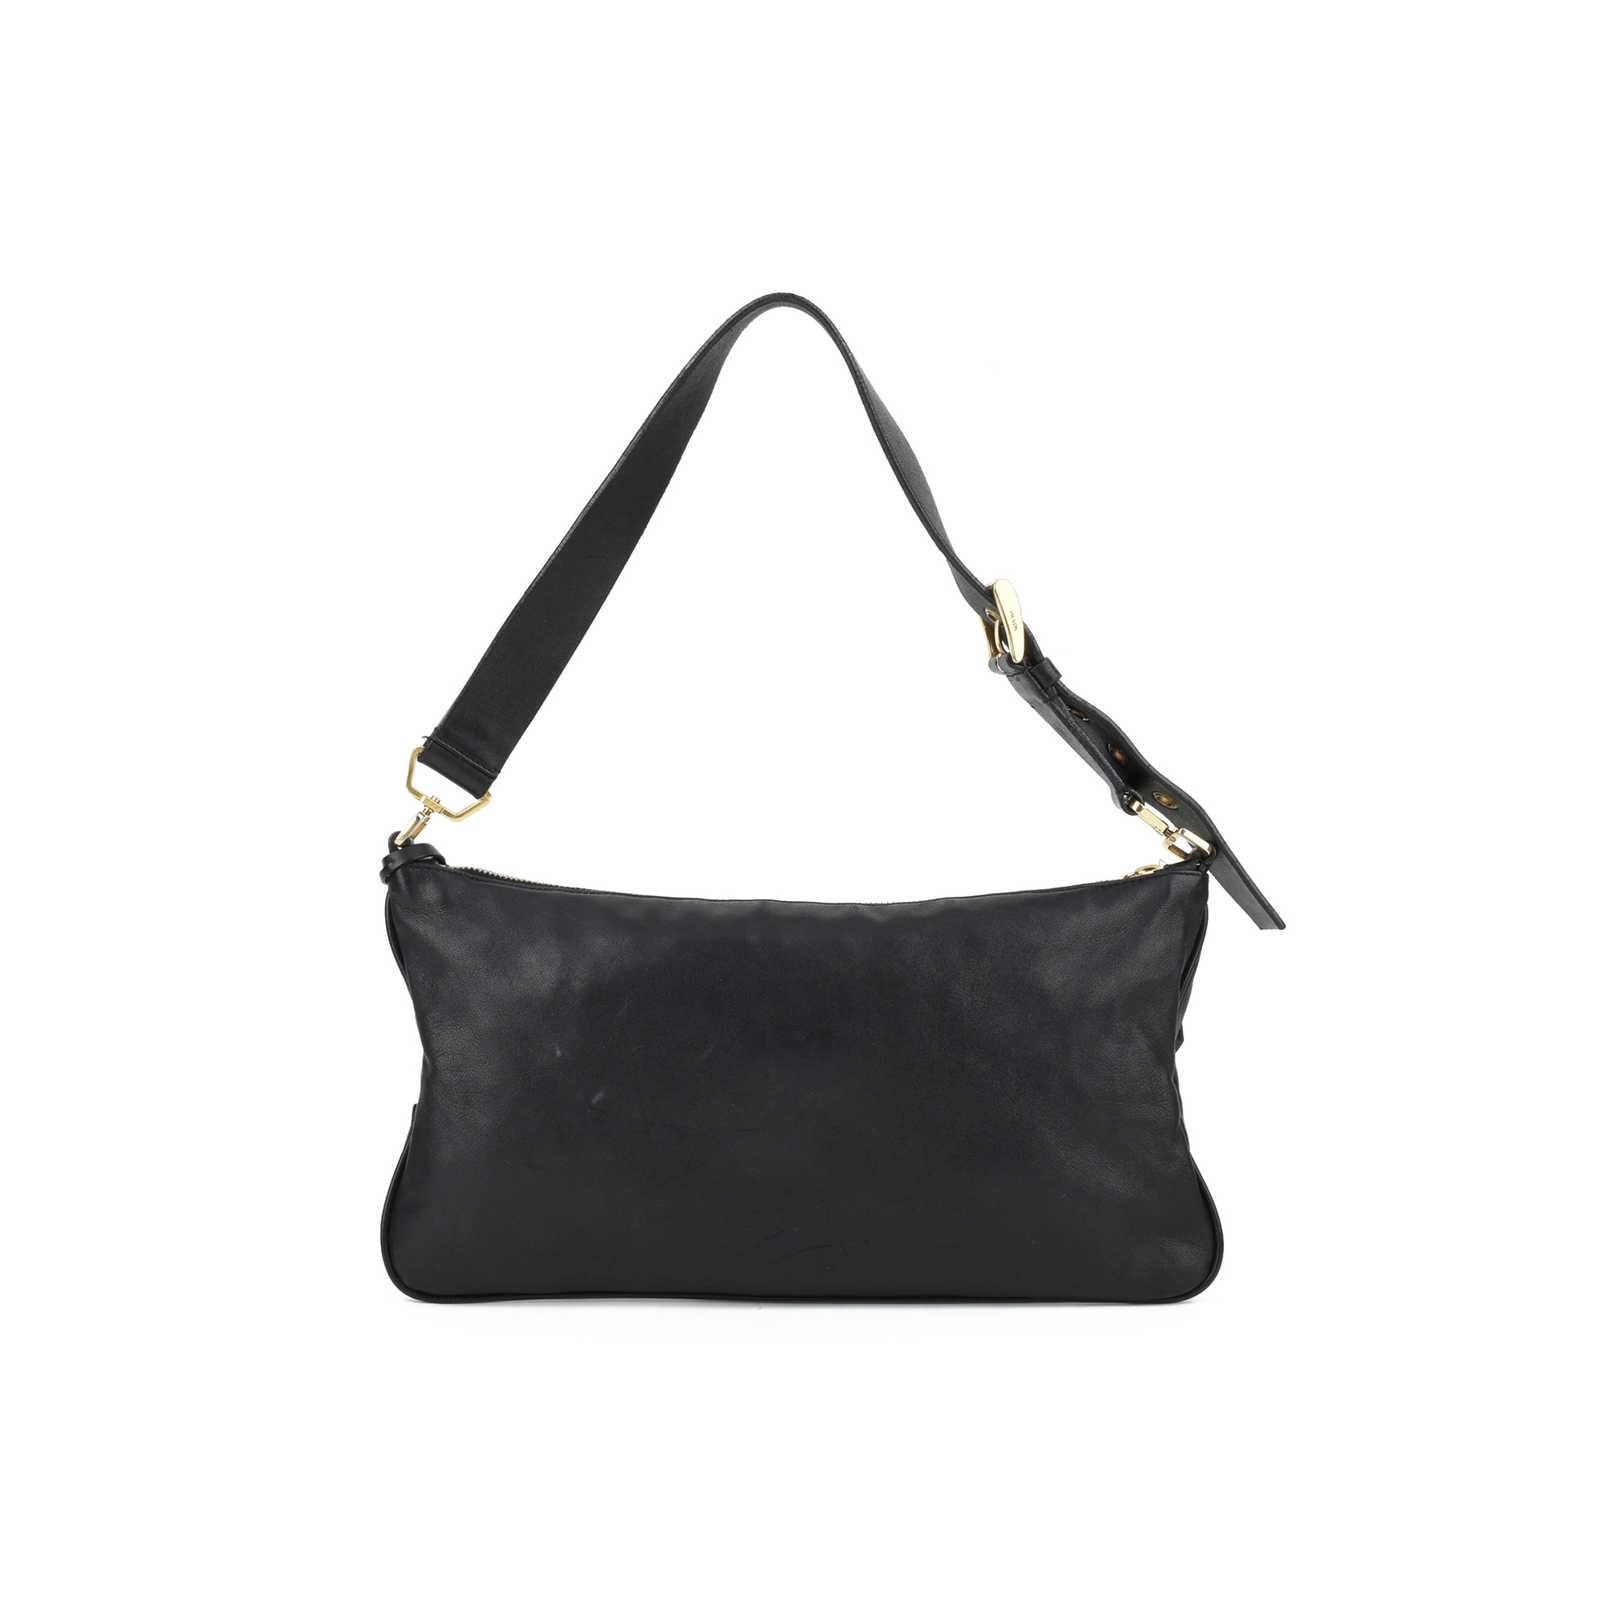 ebb49d54c2ce ... Authentic Second Hand Prada Lock and Key Shoulder Bag (PSS-126-00053)  ...